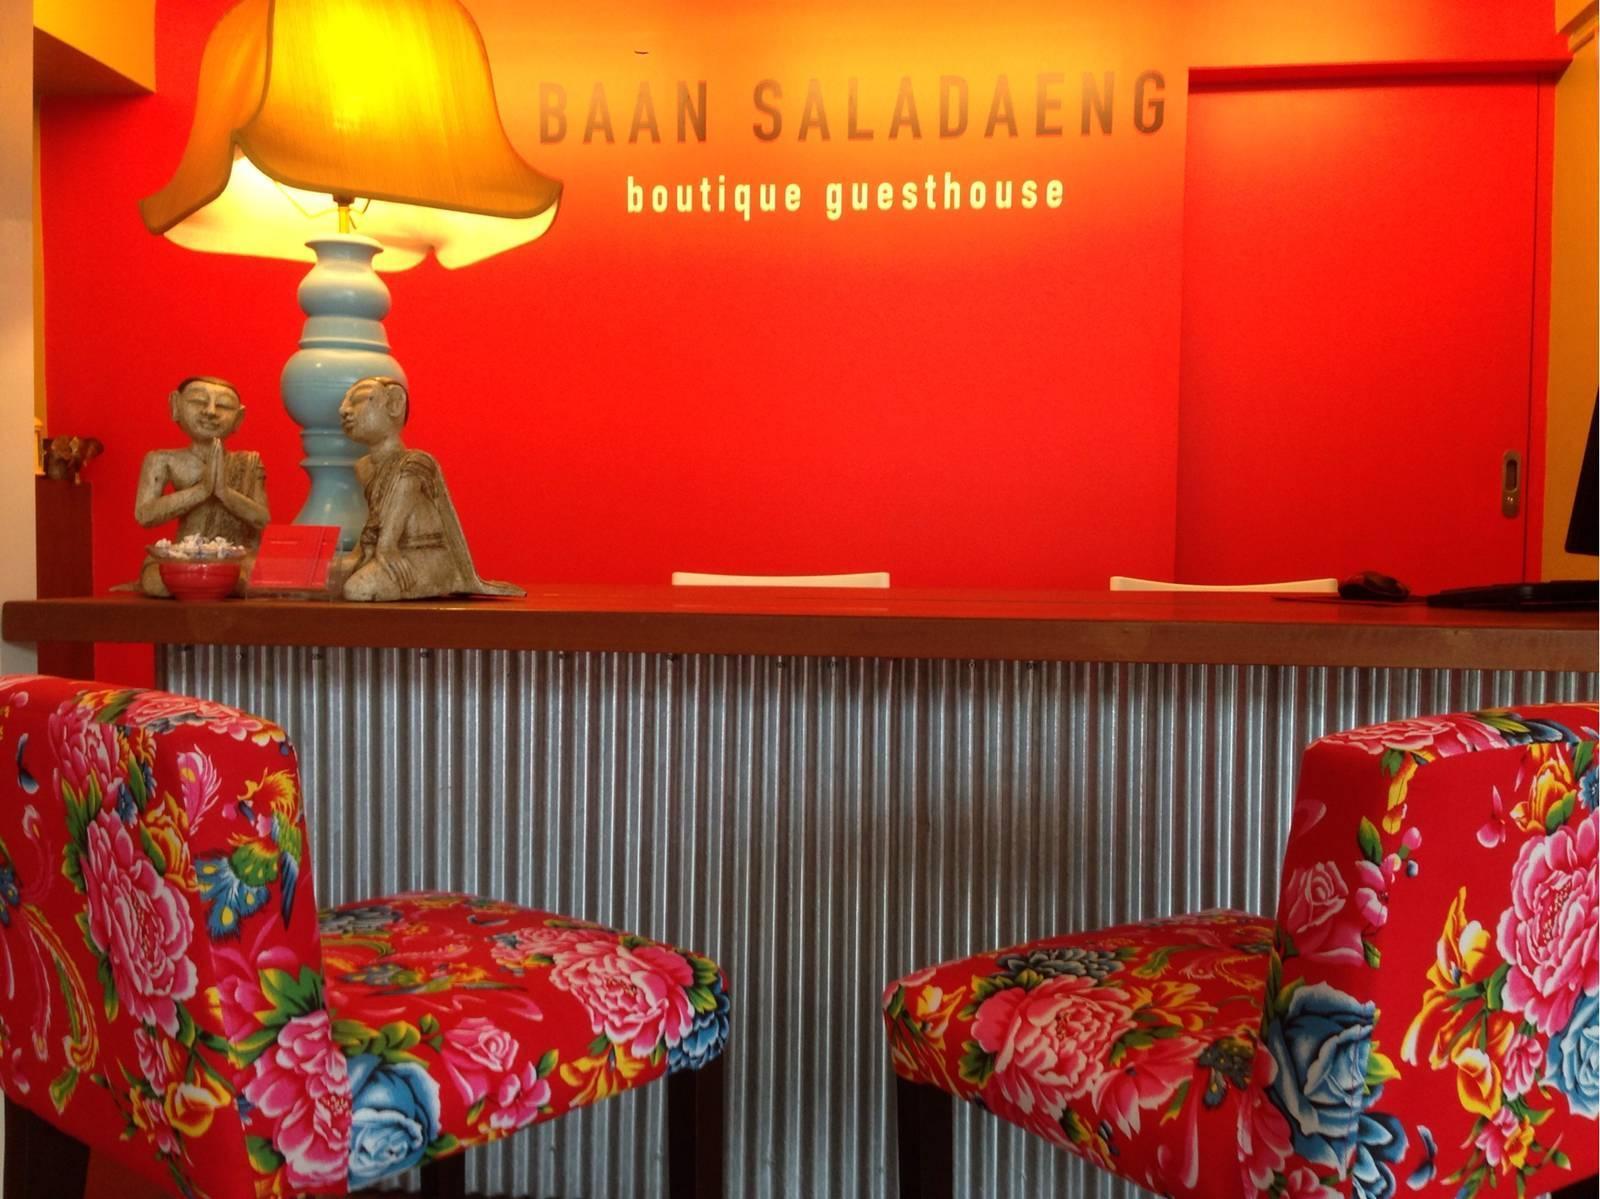 Baan Saladaeng Boutique Guesthouse บ้านศาลาแดง บูติก เกสต์เฮาส์